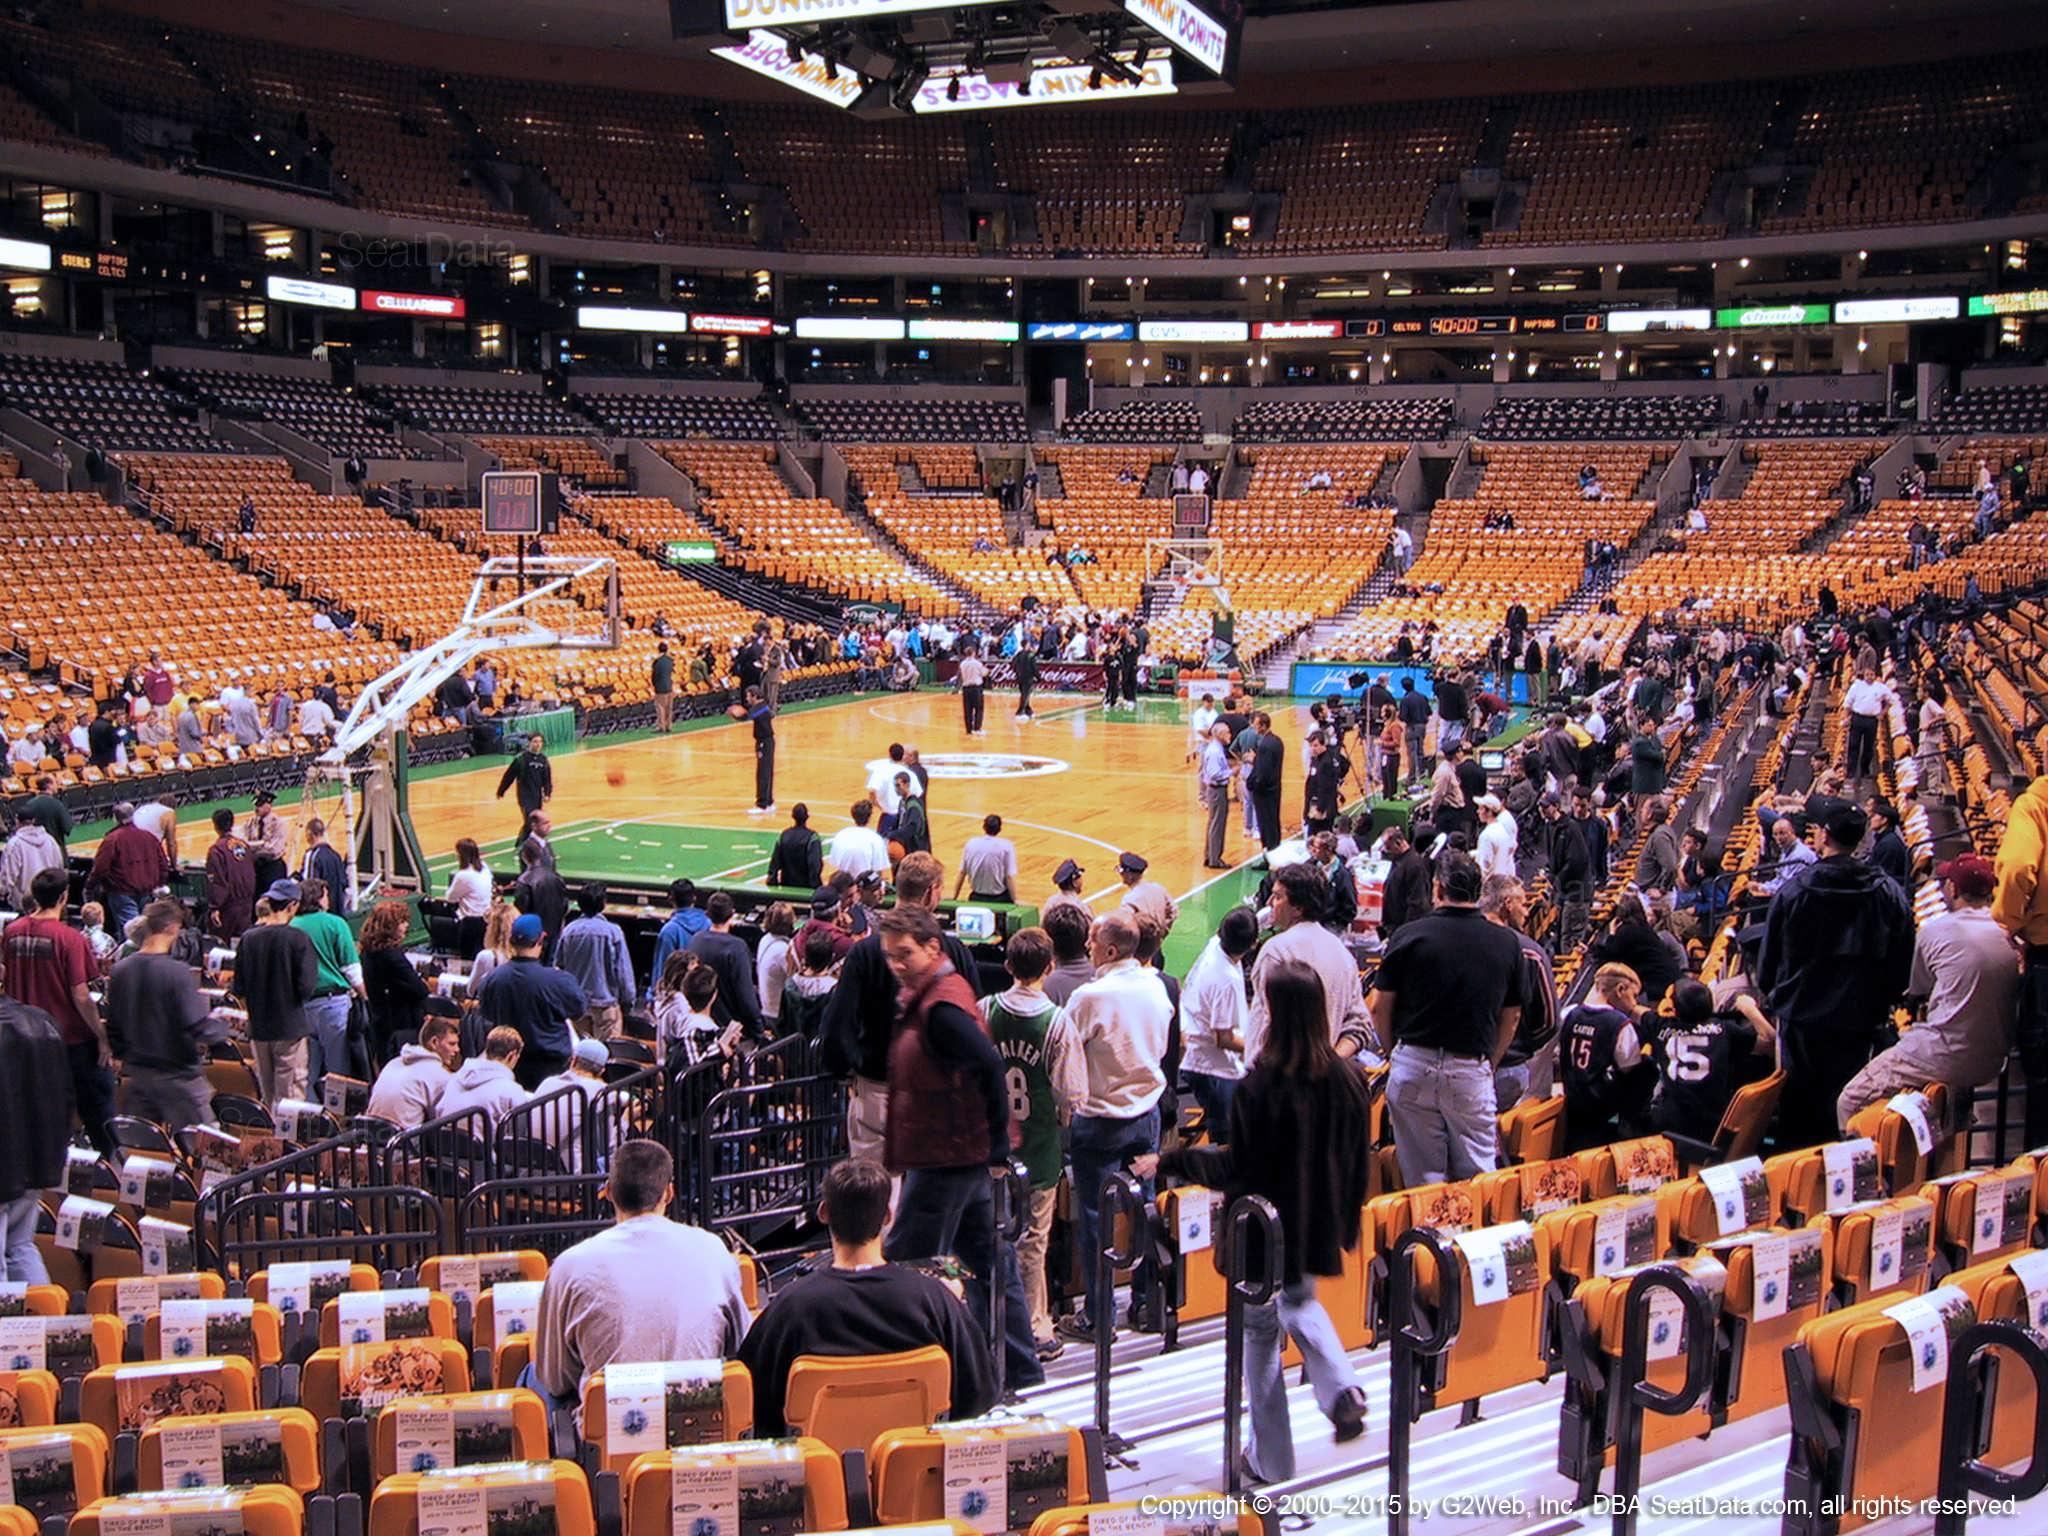 ... Seating Gardening Landscaping Ingenious Ideas Td Garden Concert Seating  TD Section BAL Home Of Boston Bruins Celtics TD Garden Loge Boston Celtics  ...